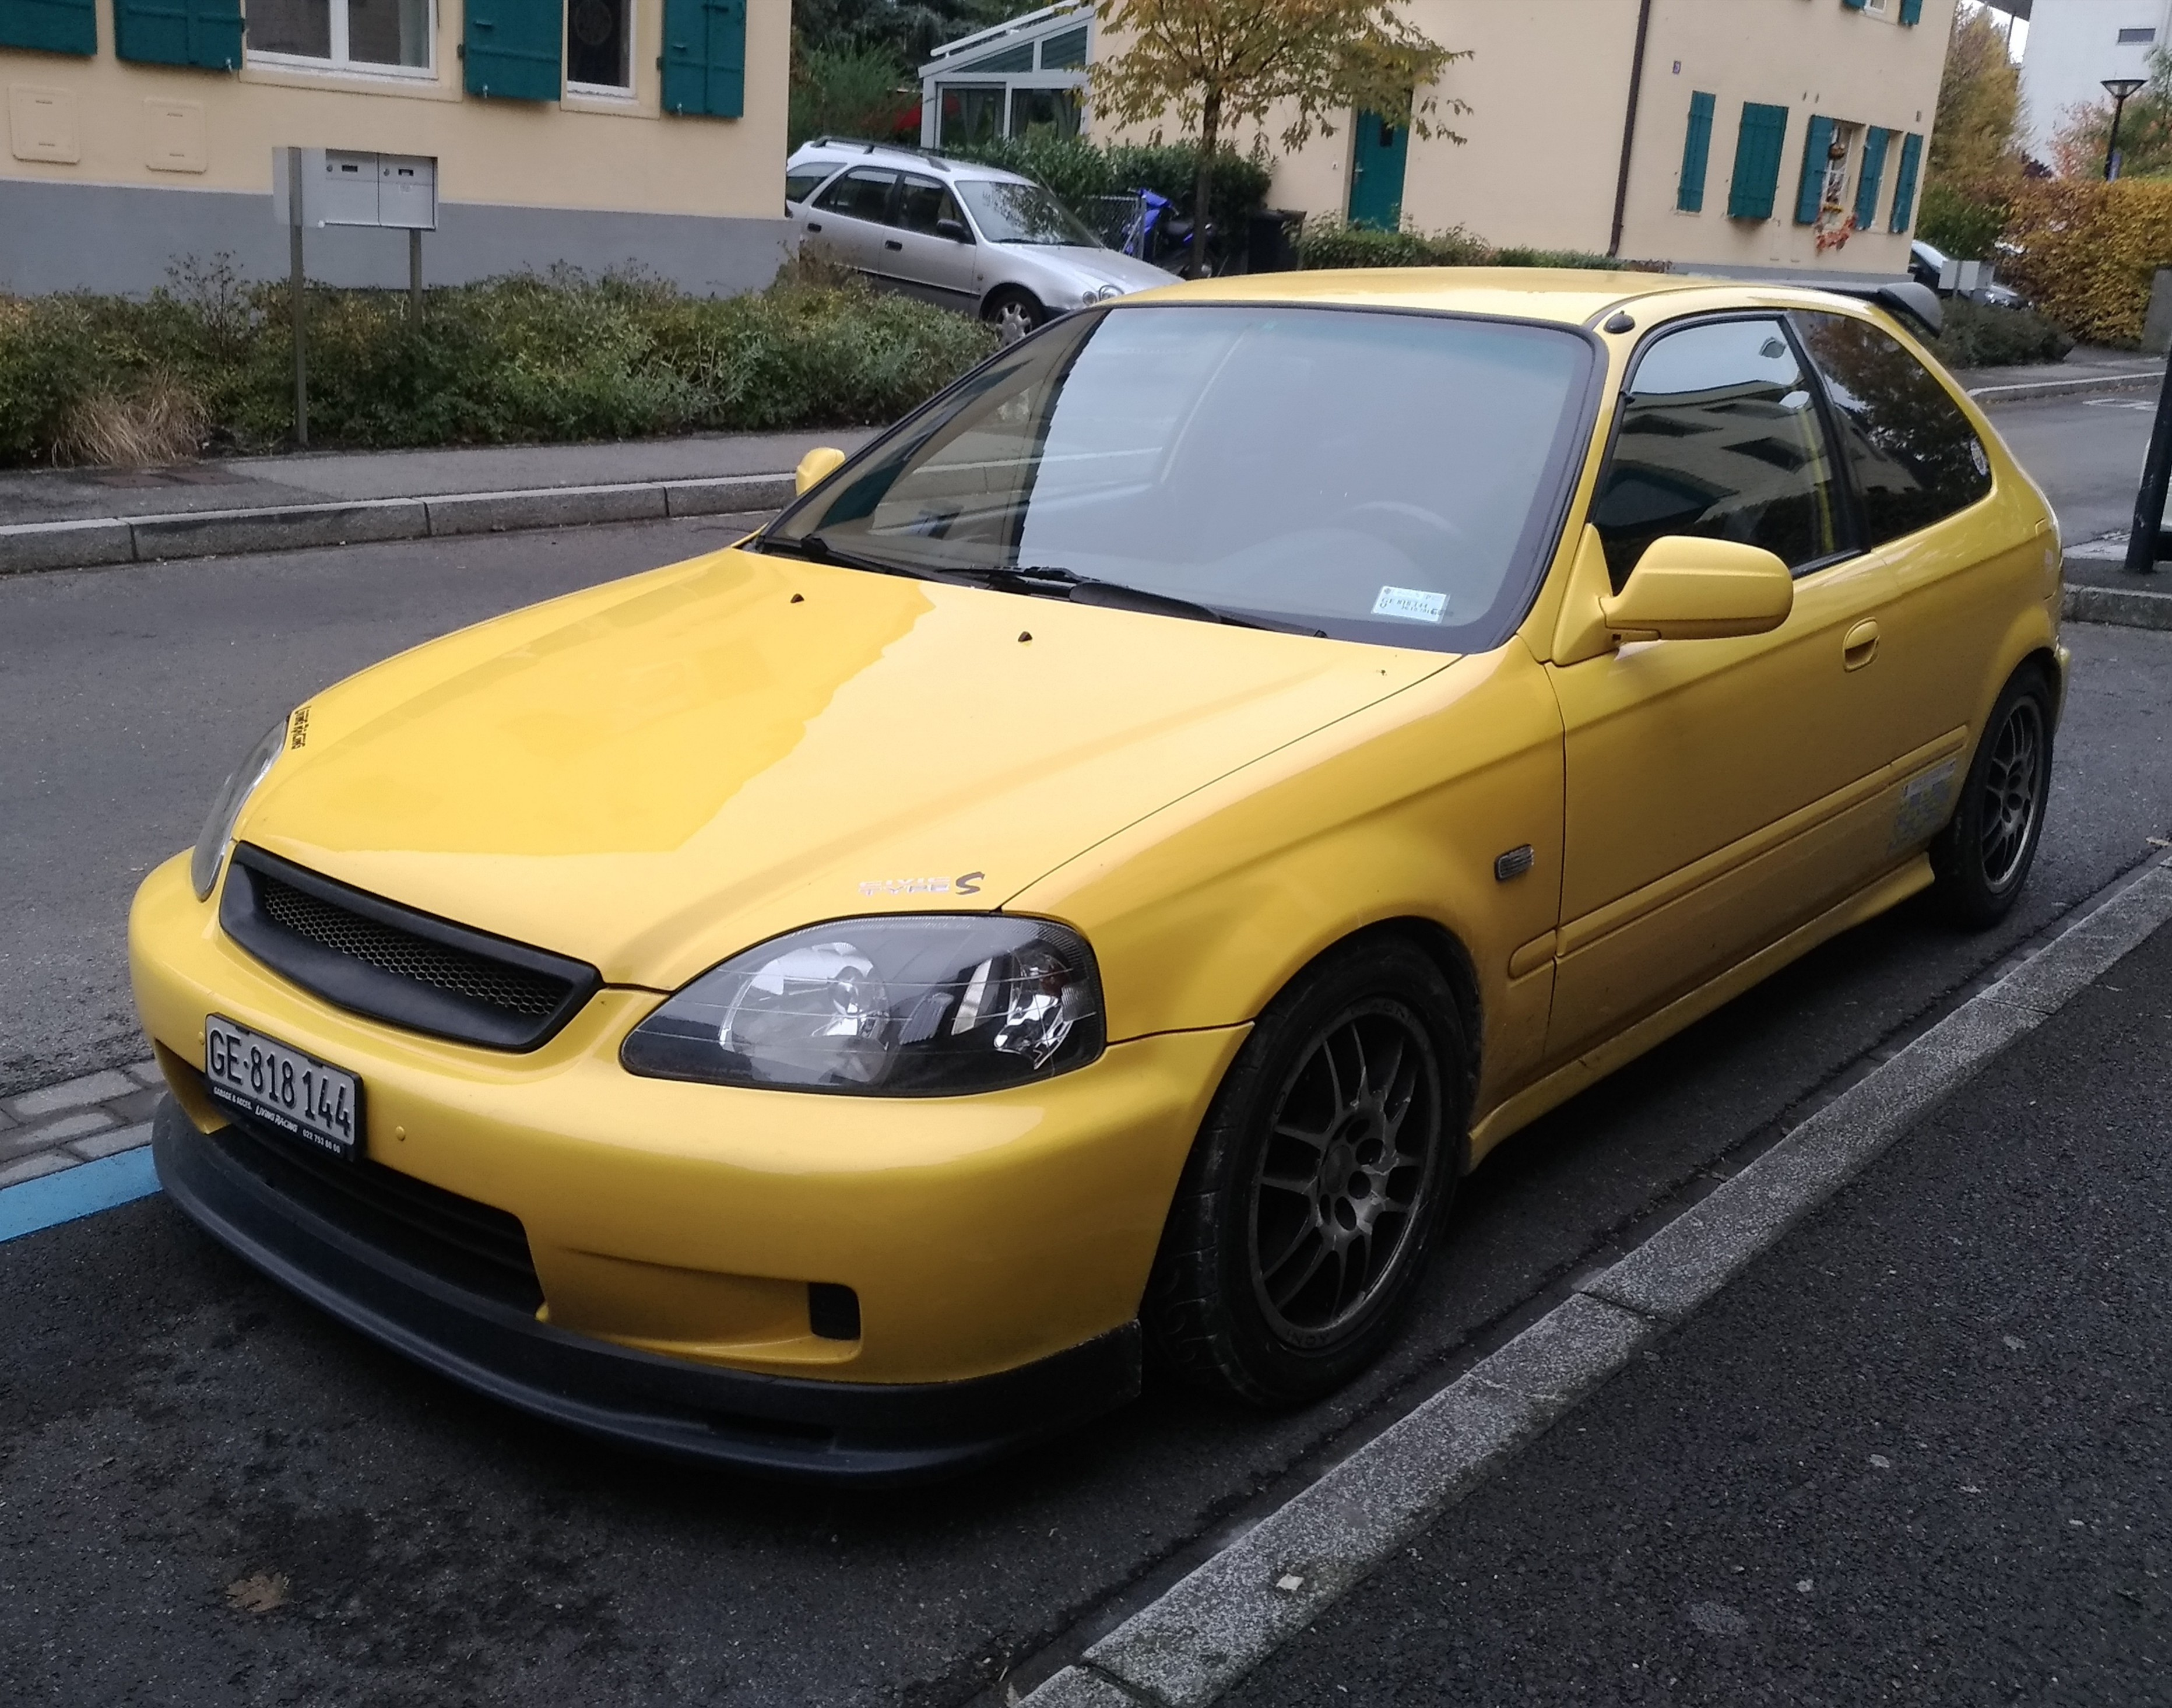 Kekurangan Civic Ek9 Spesifikasi